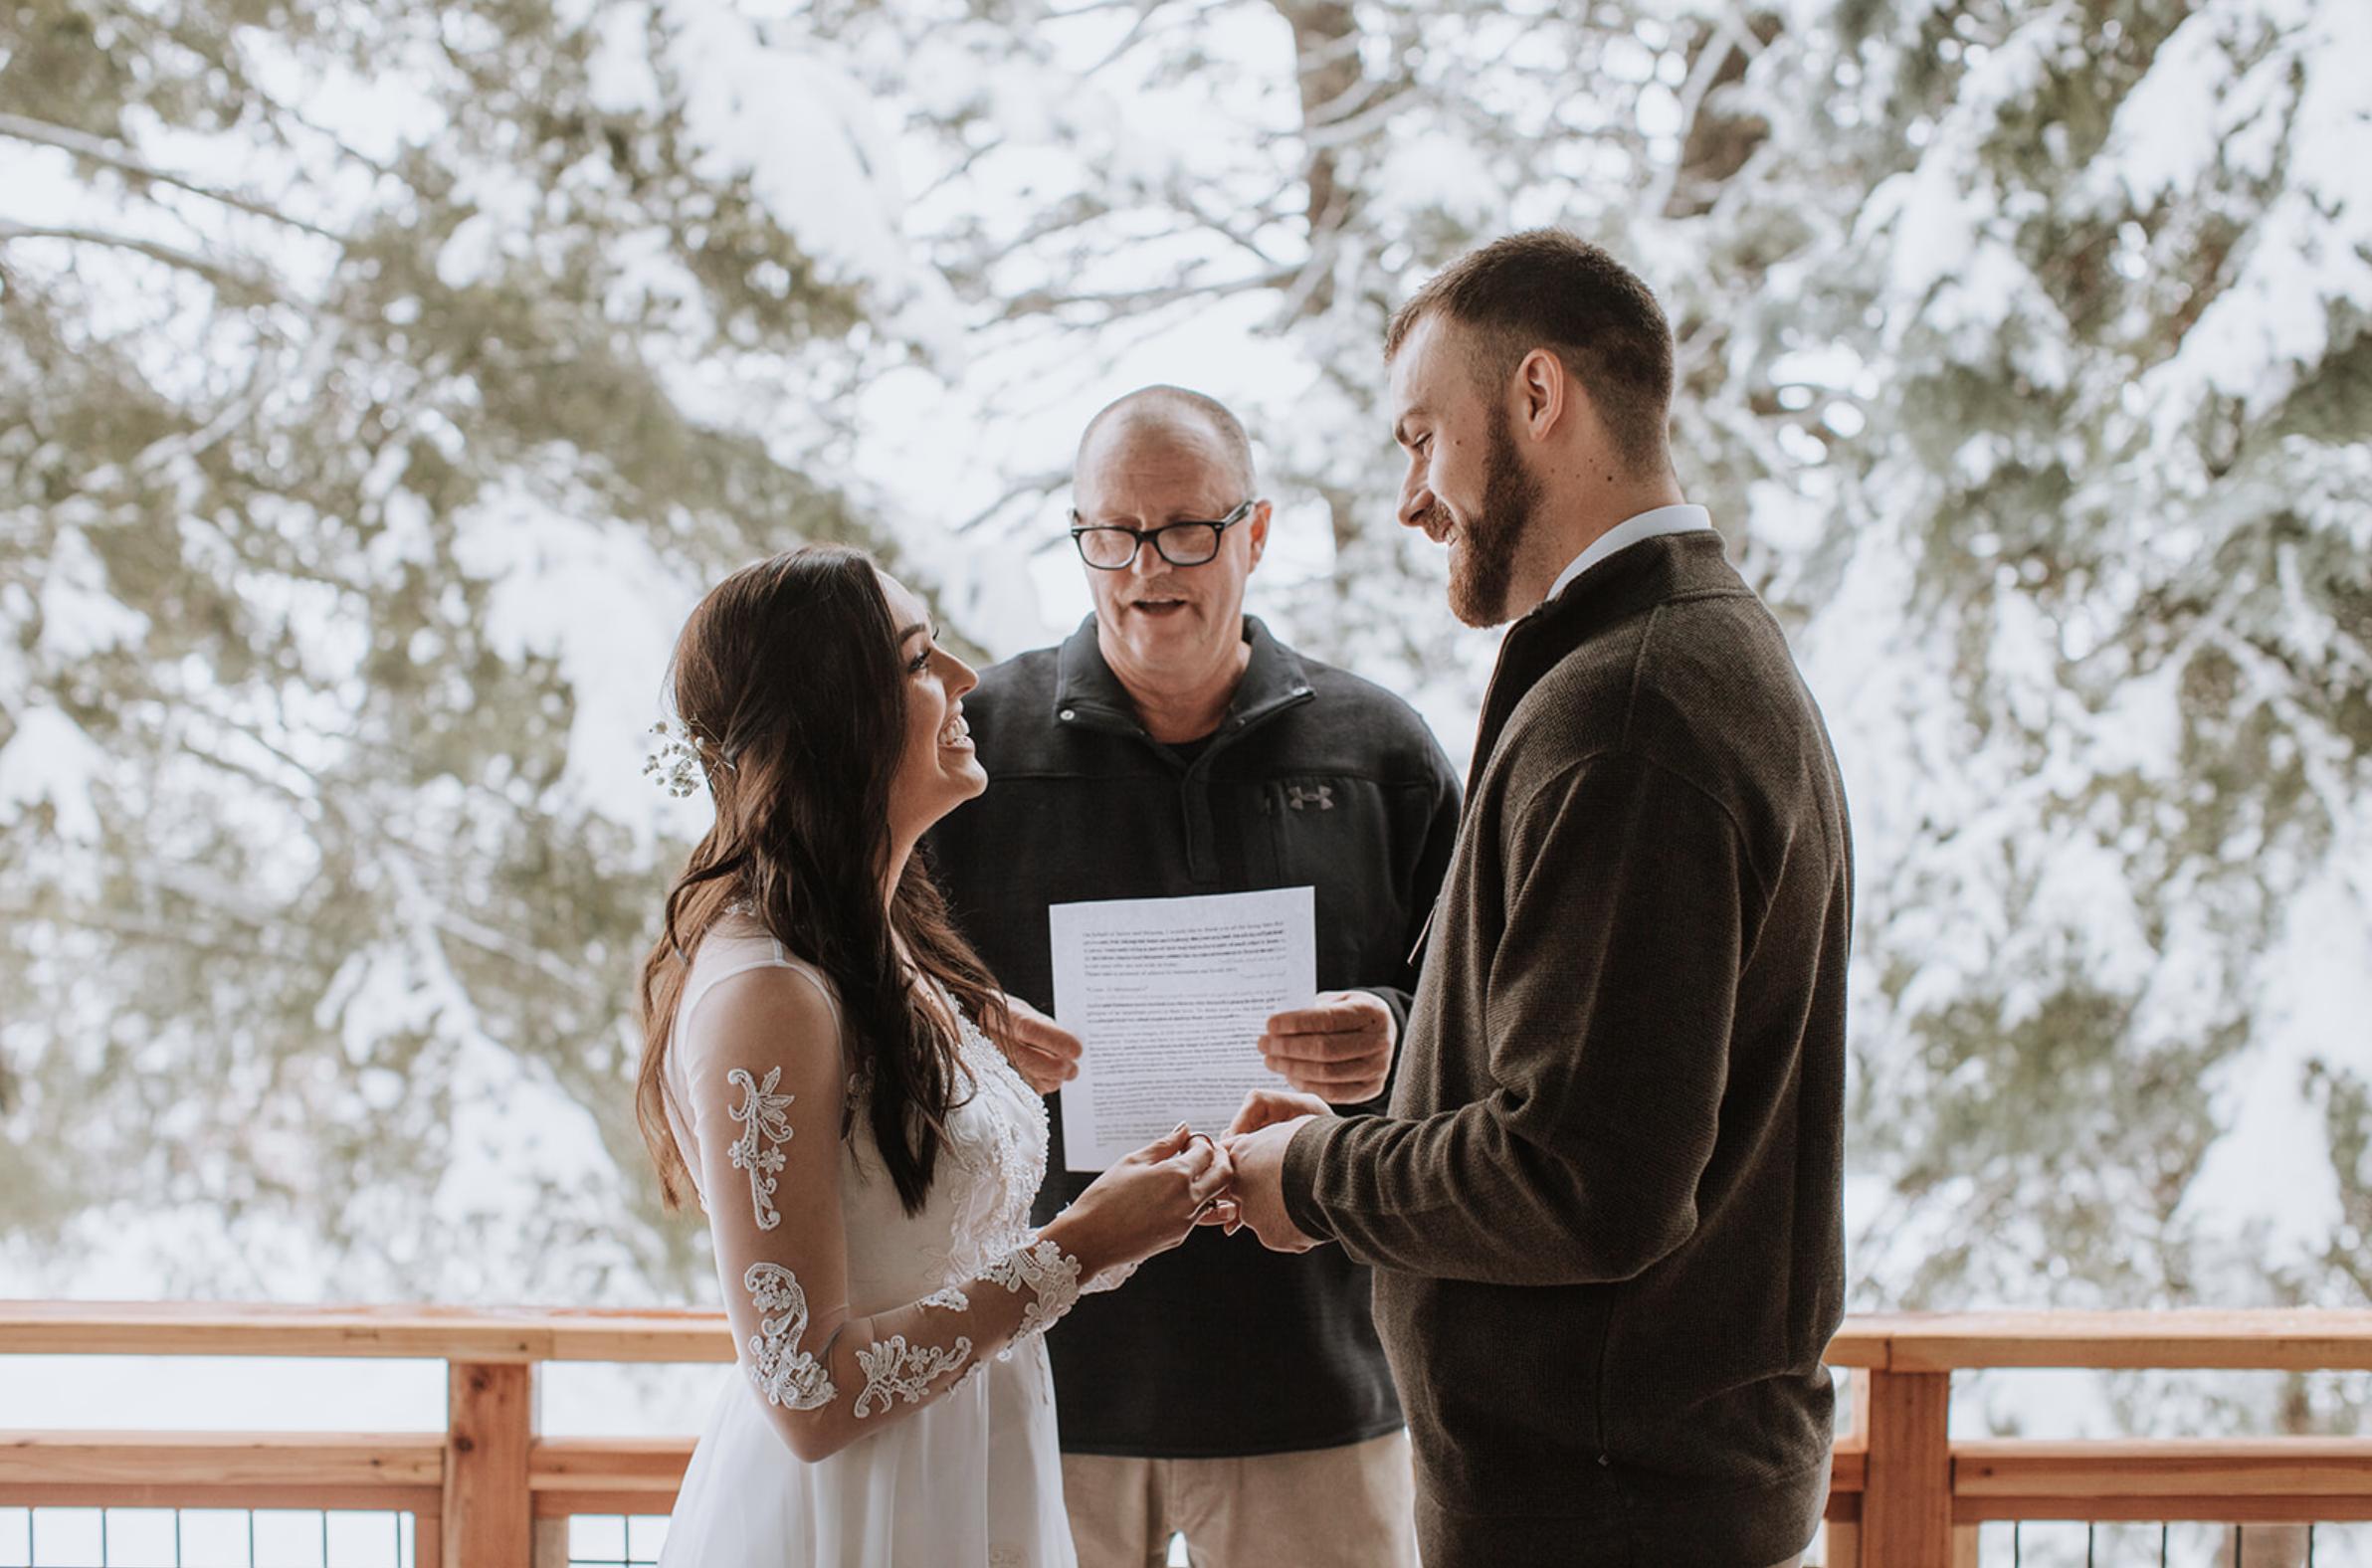 Cascade Idaho Winter Elopement Wedding Photography Leah Flores